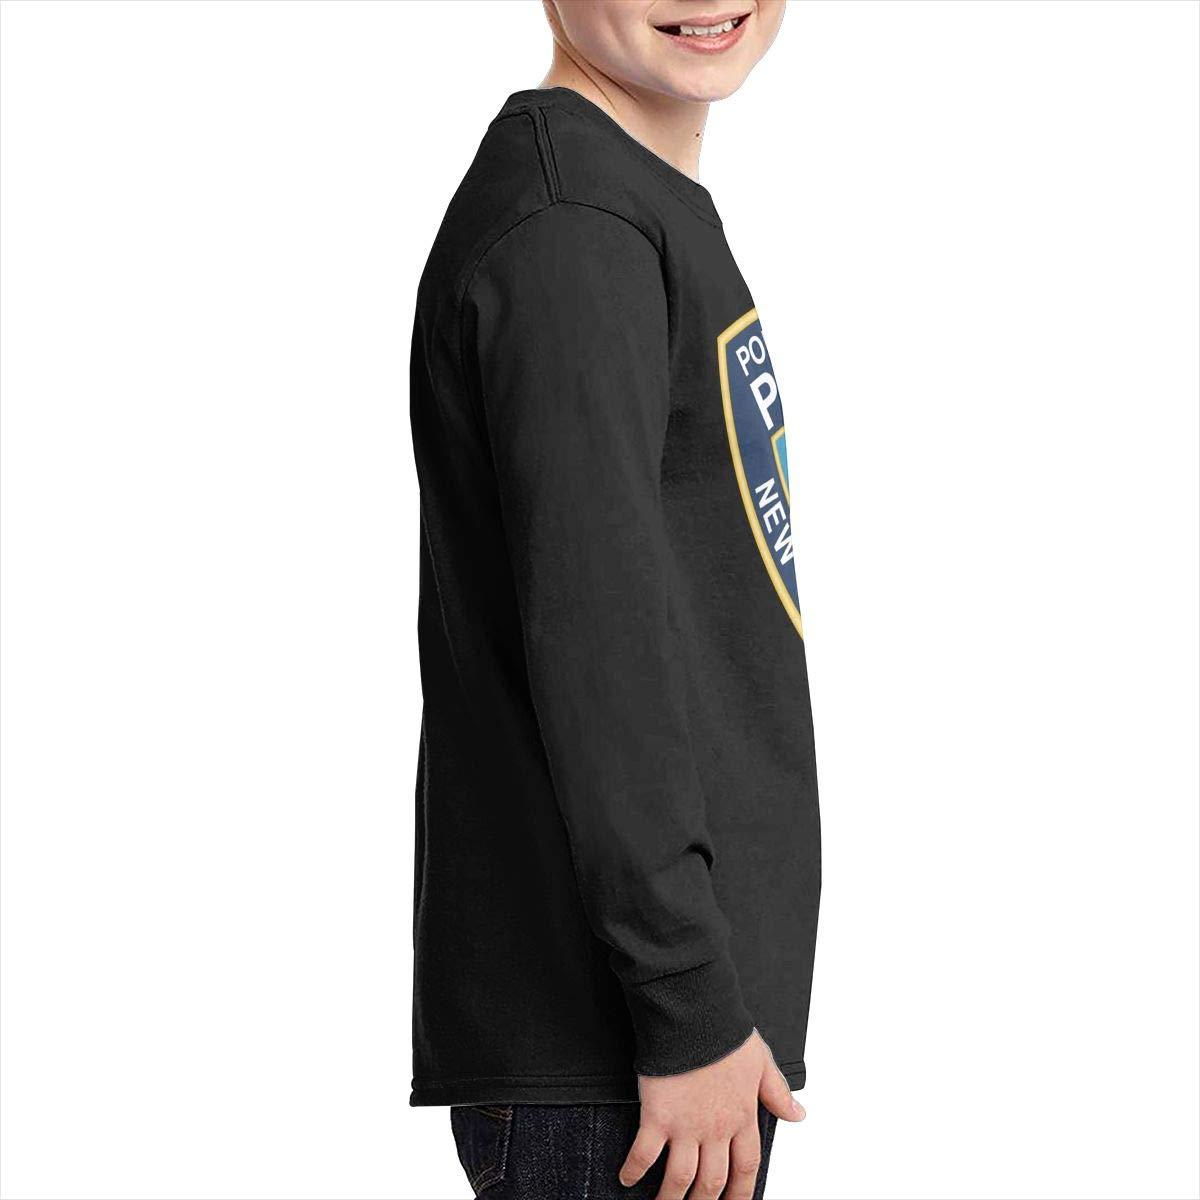 Onlybabycare New Jersey State Police Logo Teen Boy Girl Moisture Pullover Sweatshirt Casual Shirt